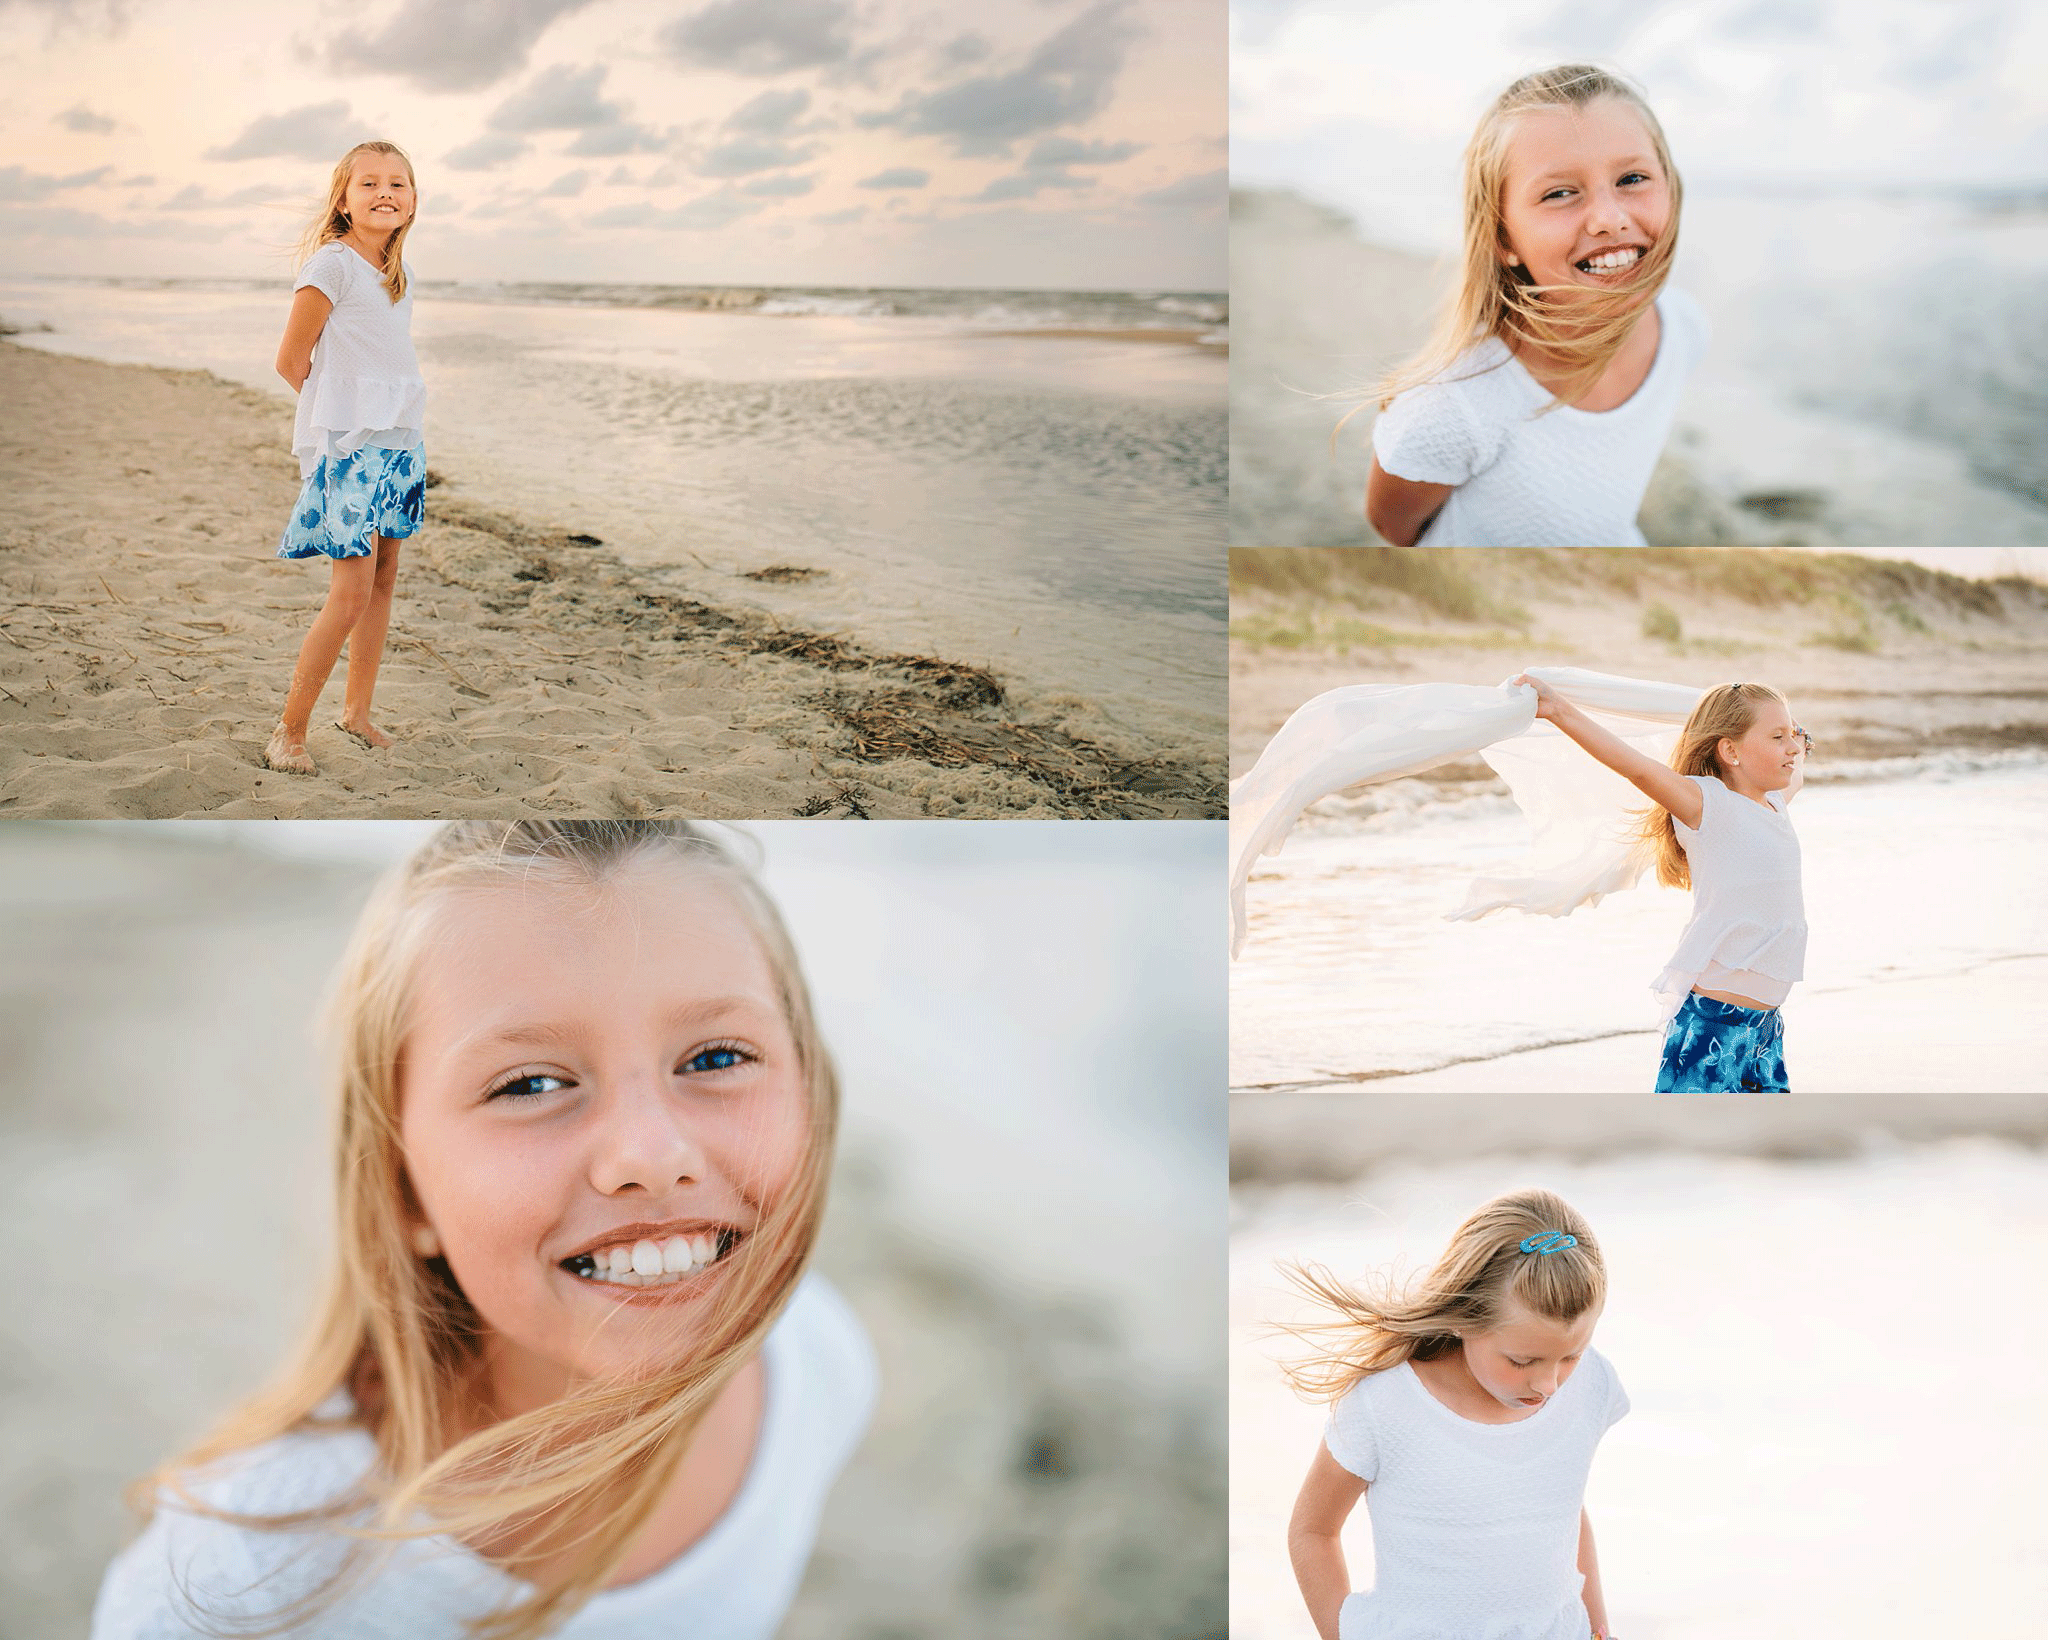 sunset-beach-photo-session-child-photographer-melissa-bliss-photography-virginia-beach-norfolk-portsmouth-chesapeake-sandbridge-beach.png